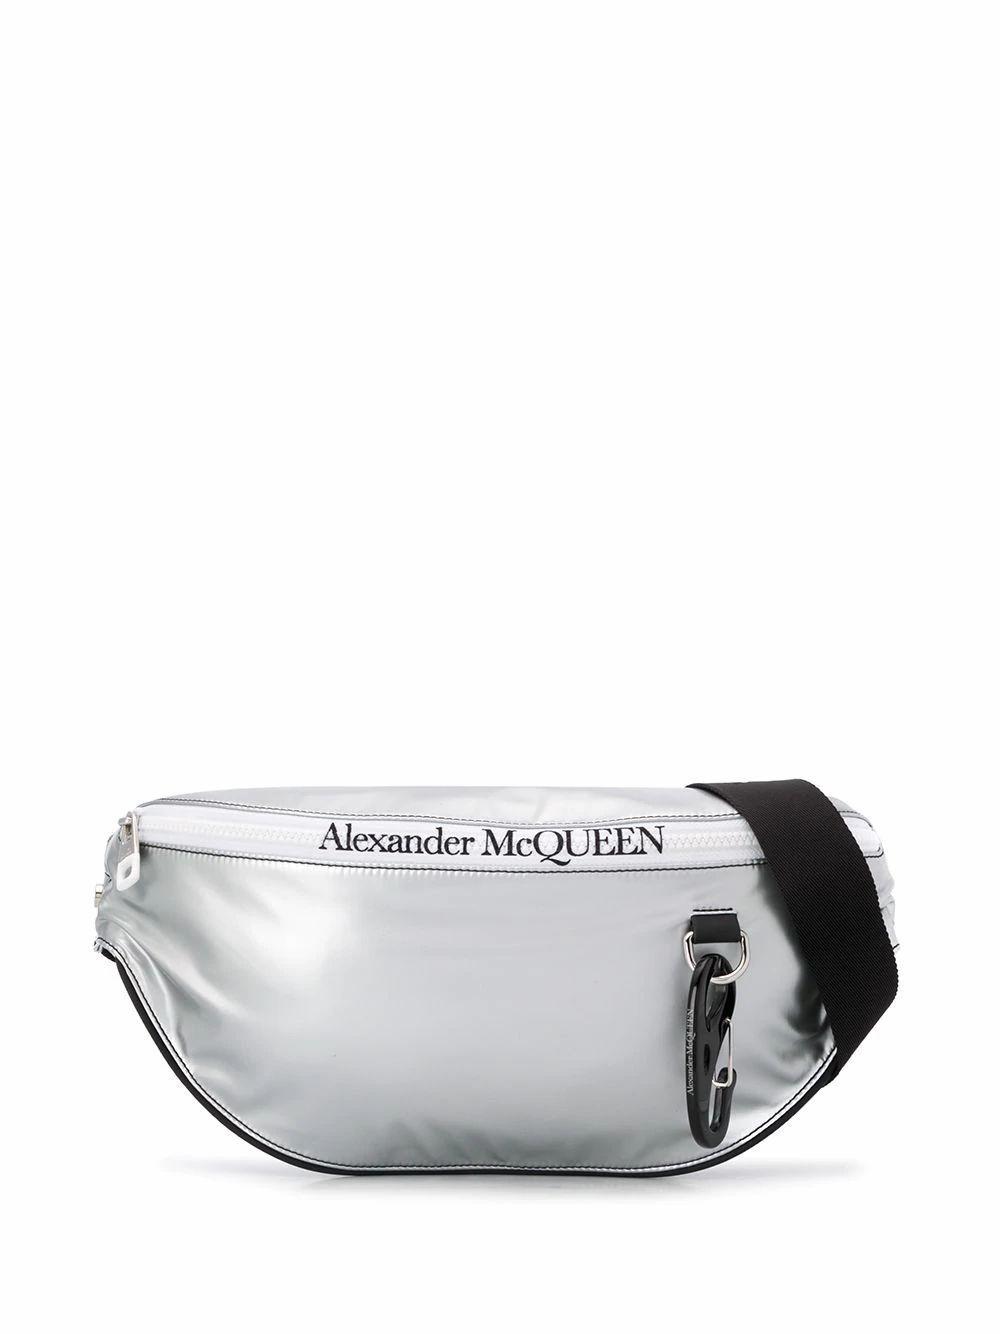 ALEXANDER MCQUEEN MEN'S 605053HUZ1K1464 SILVER POLYURETHANE BELT BAG